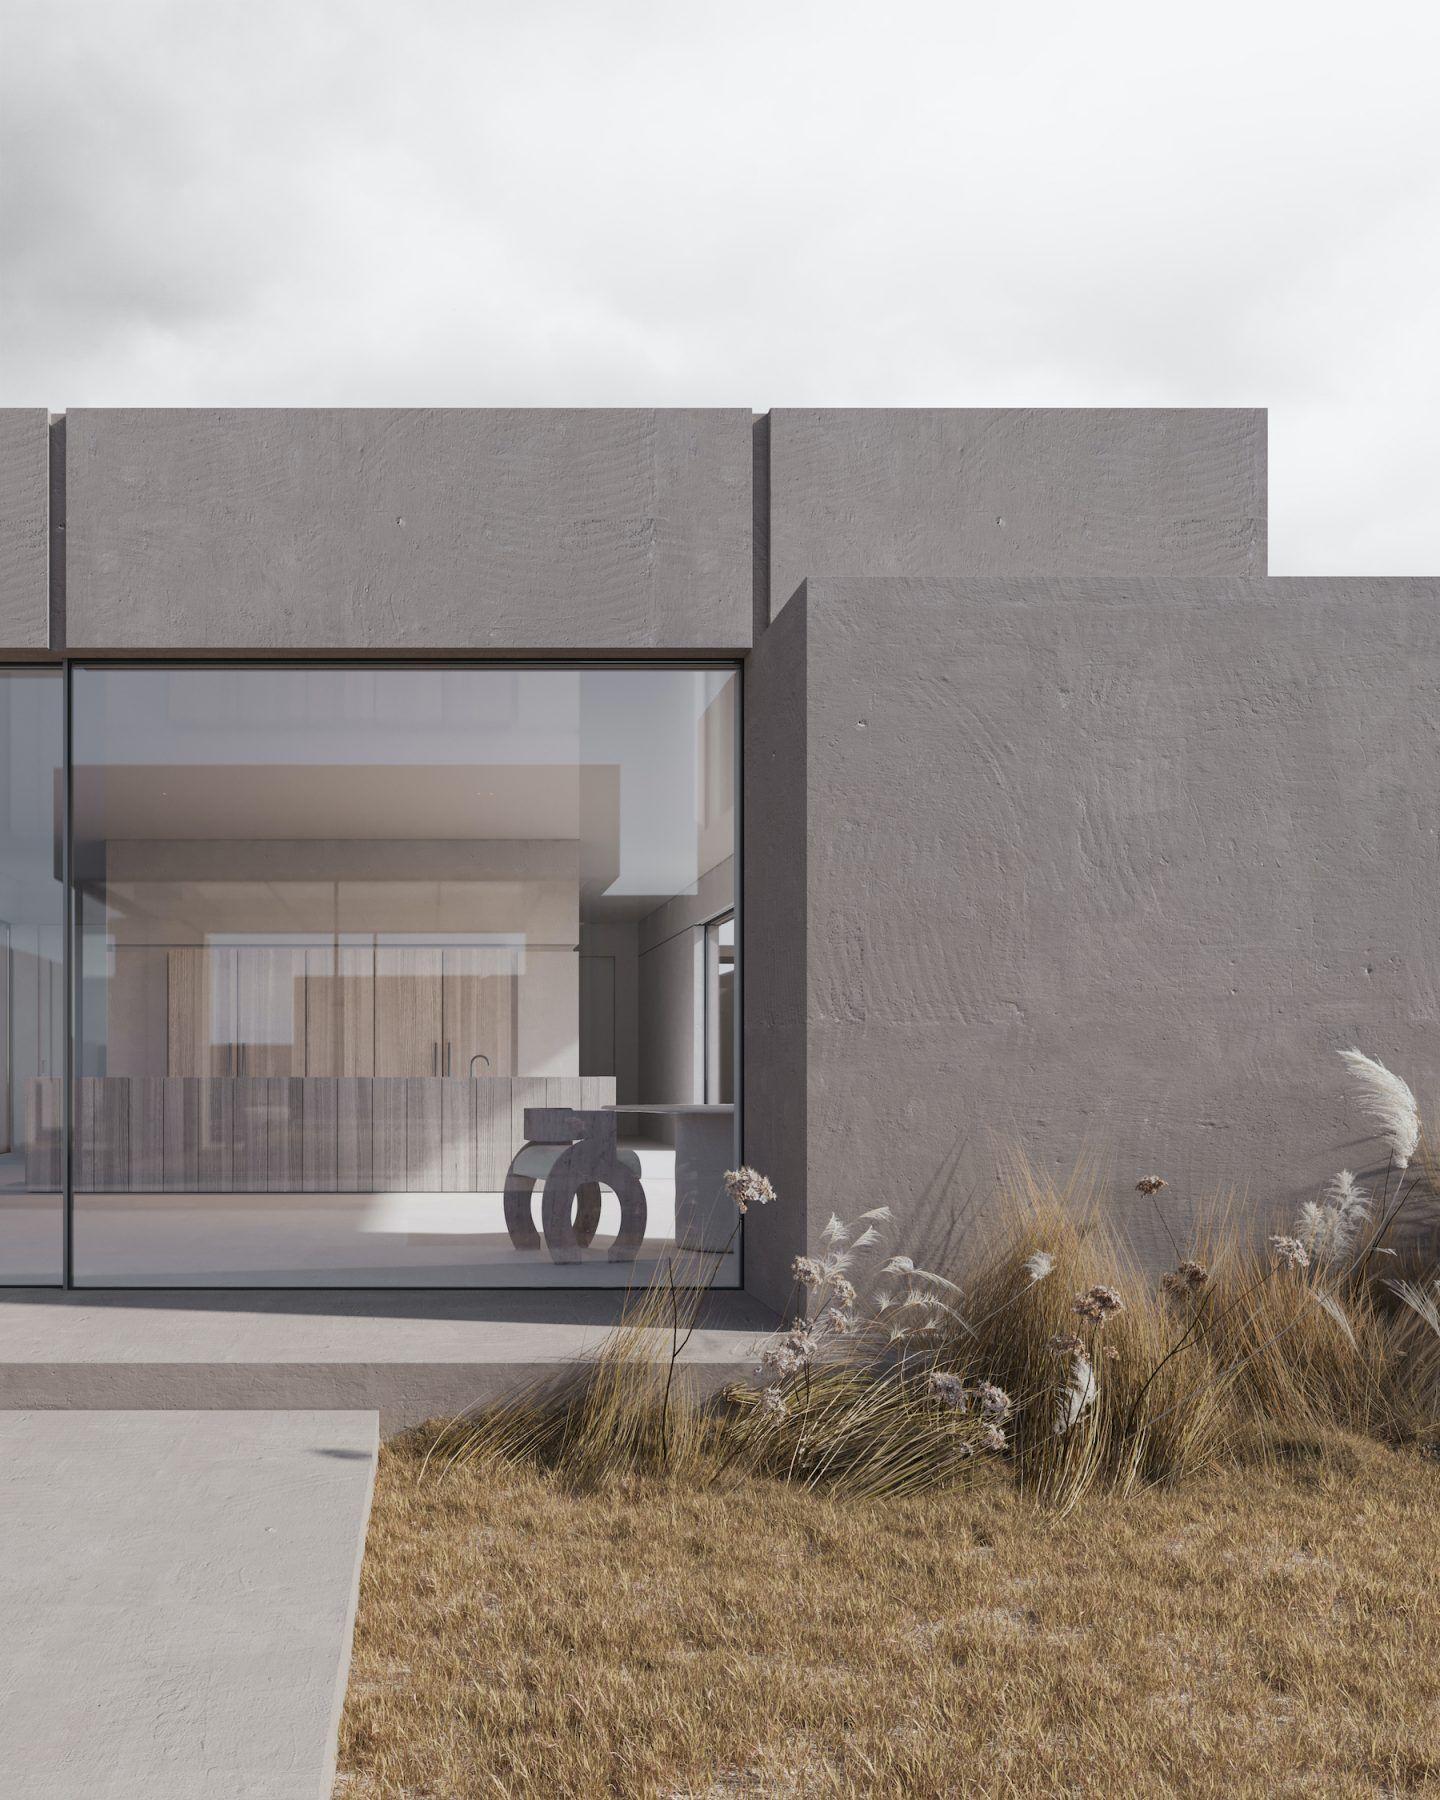 IGNANT-Design-Kanstantsin-Remez-II-Introvert-Residence-07